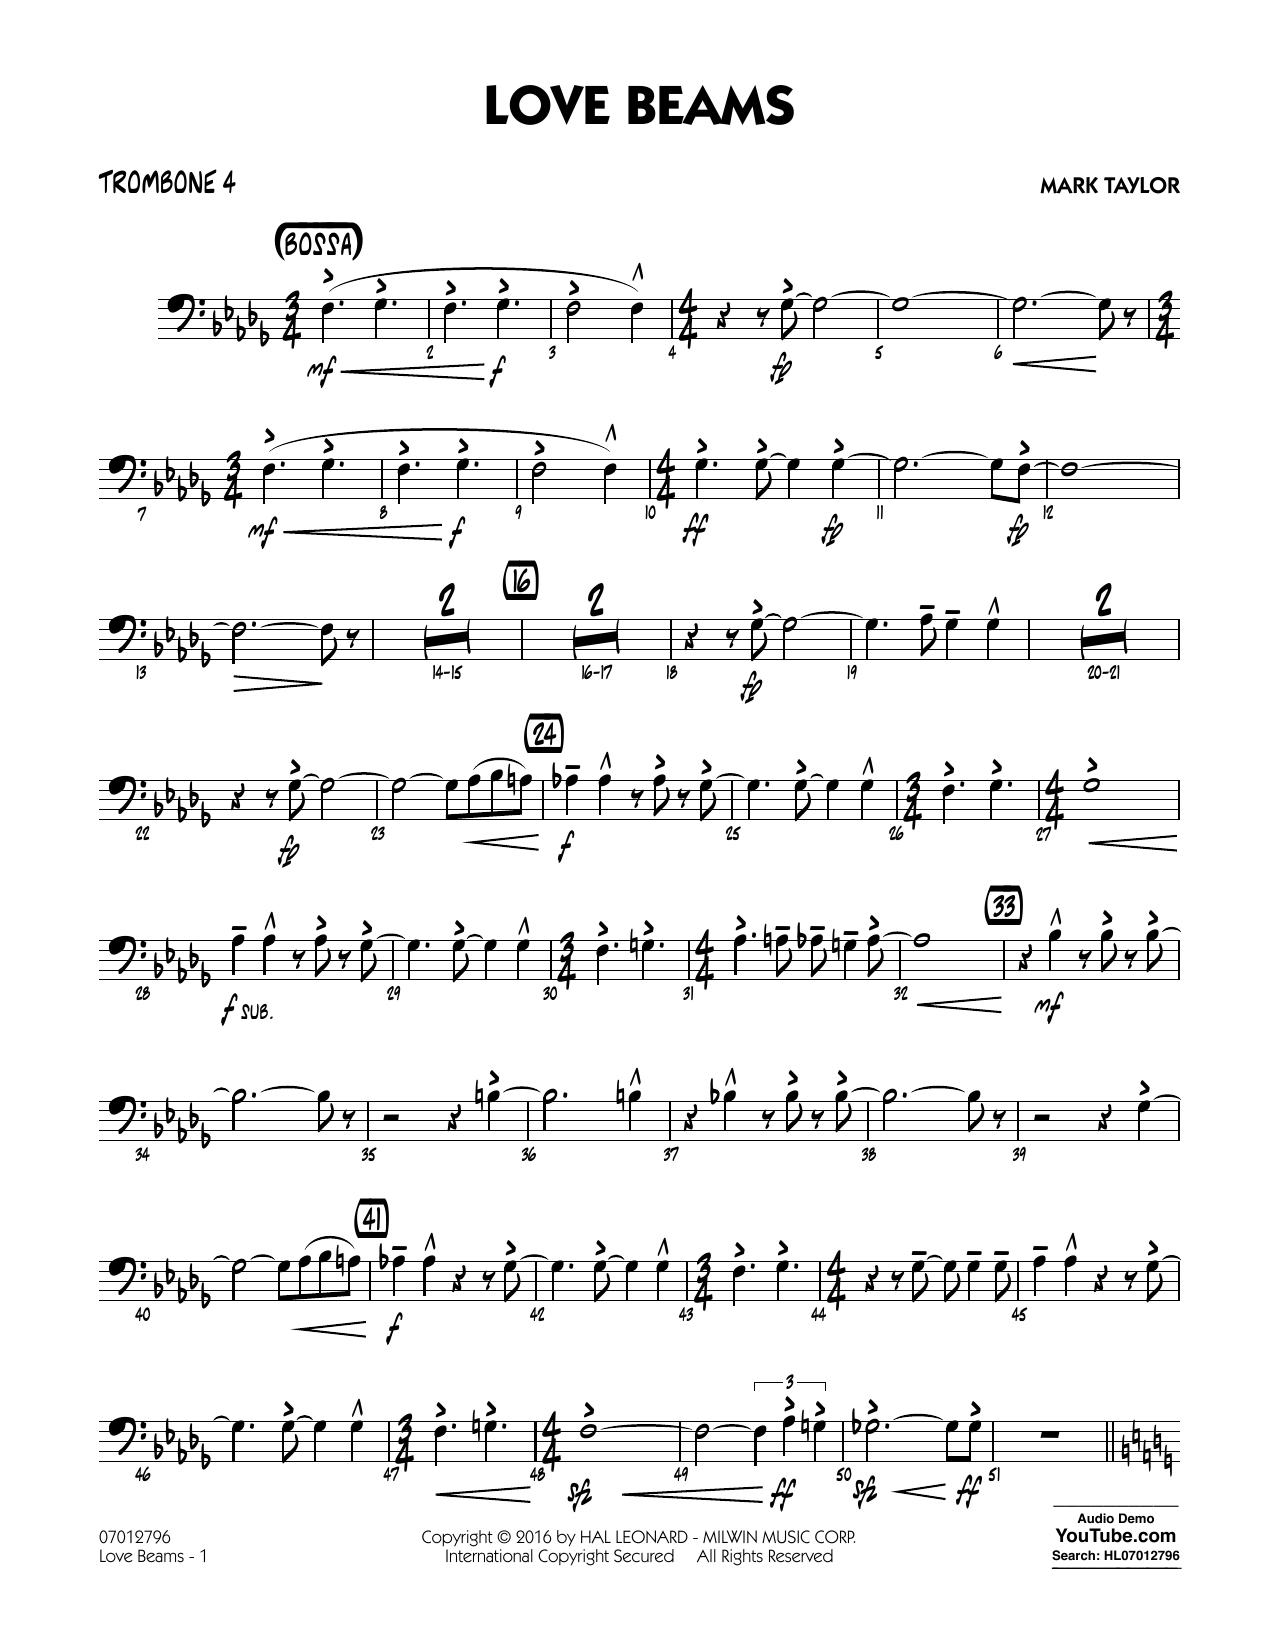 Love Beams - Trombone 4